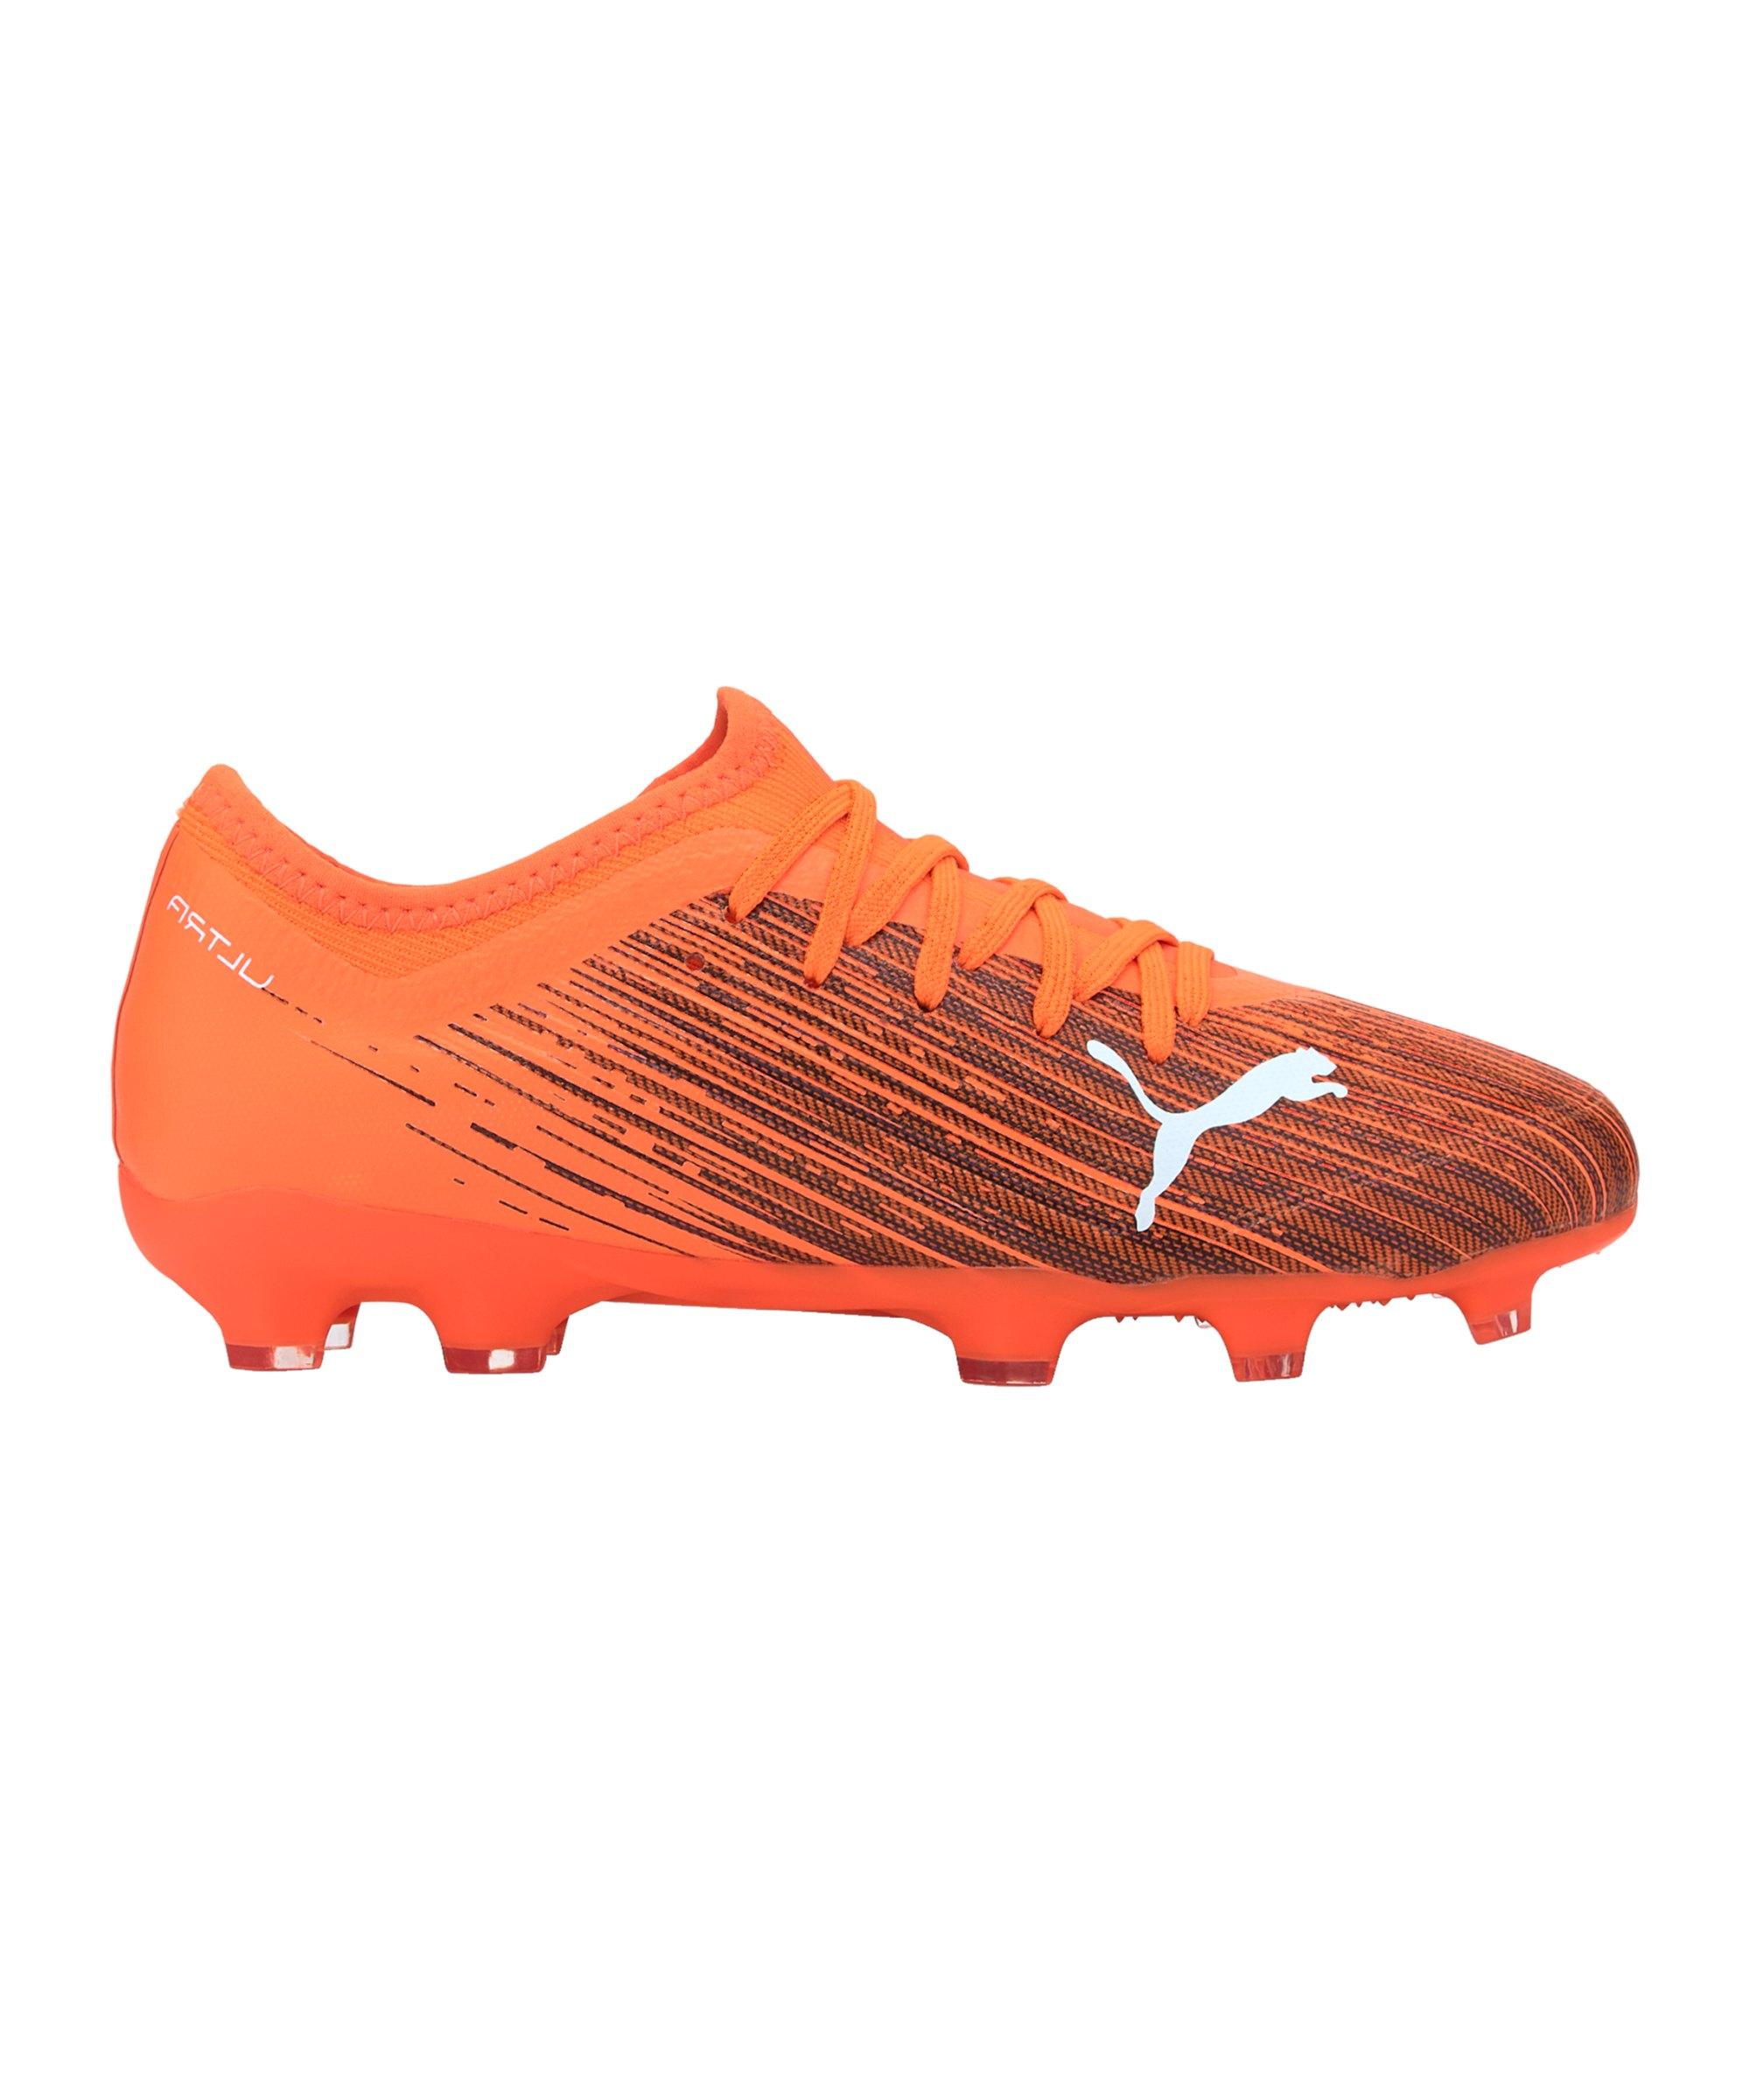 PUMA ULTRA Chasing Adrenaline 3.1 FG/AG Kids Orange F01 - orange